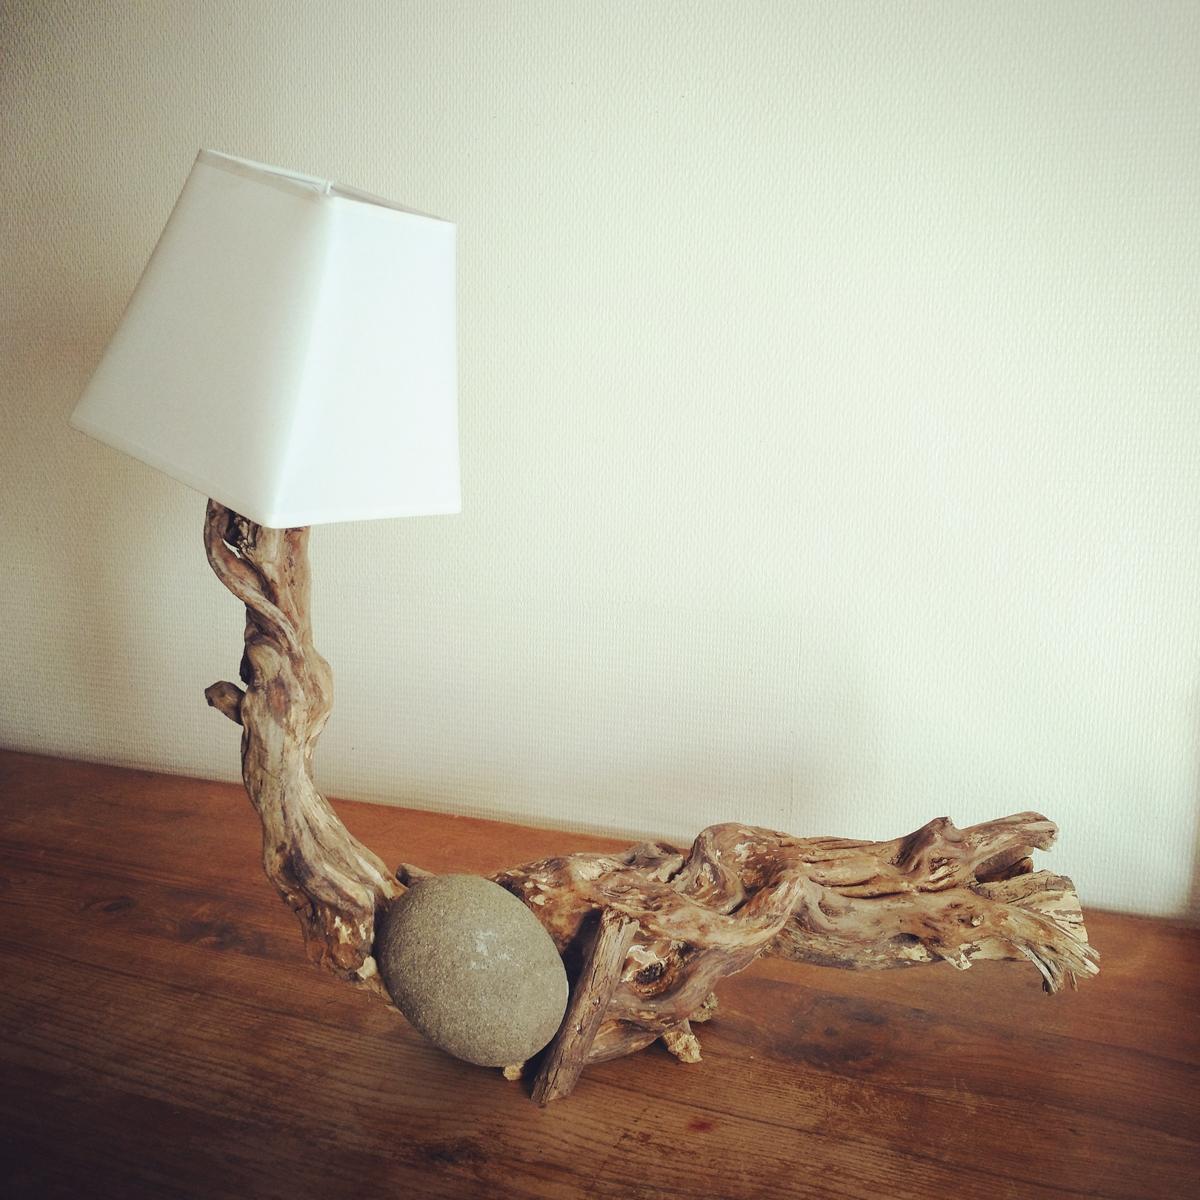 lampe bois flott et pierre art by ze studio annecy. Black Bedroom Furniture Sets. Home Design Ideas